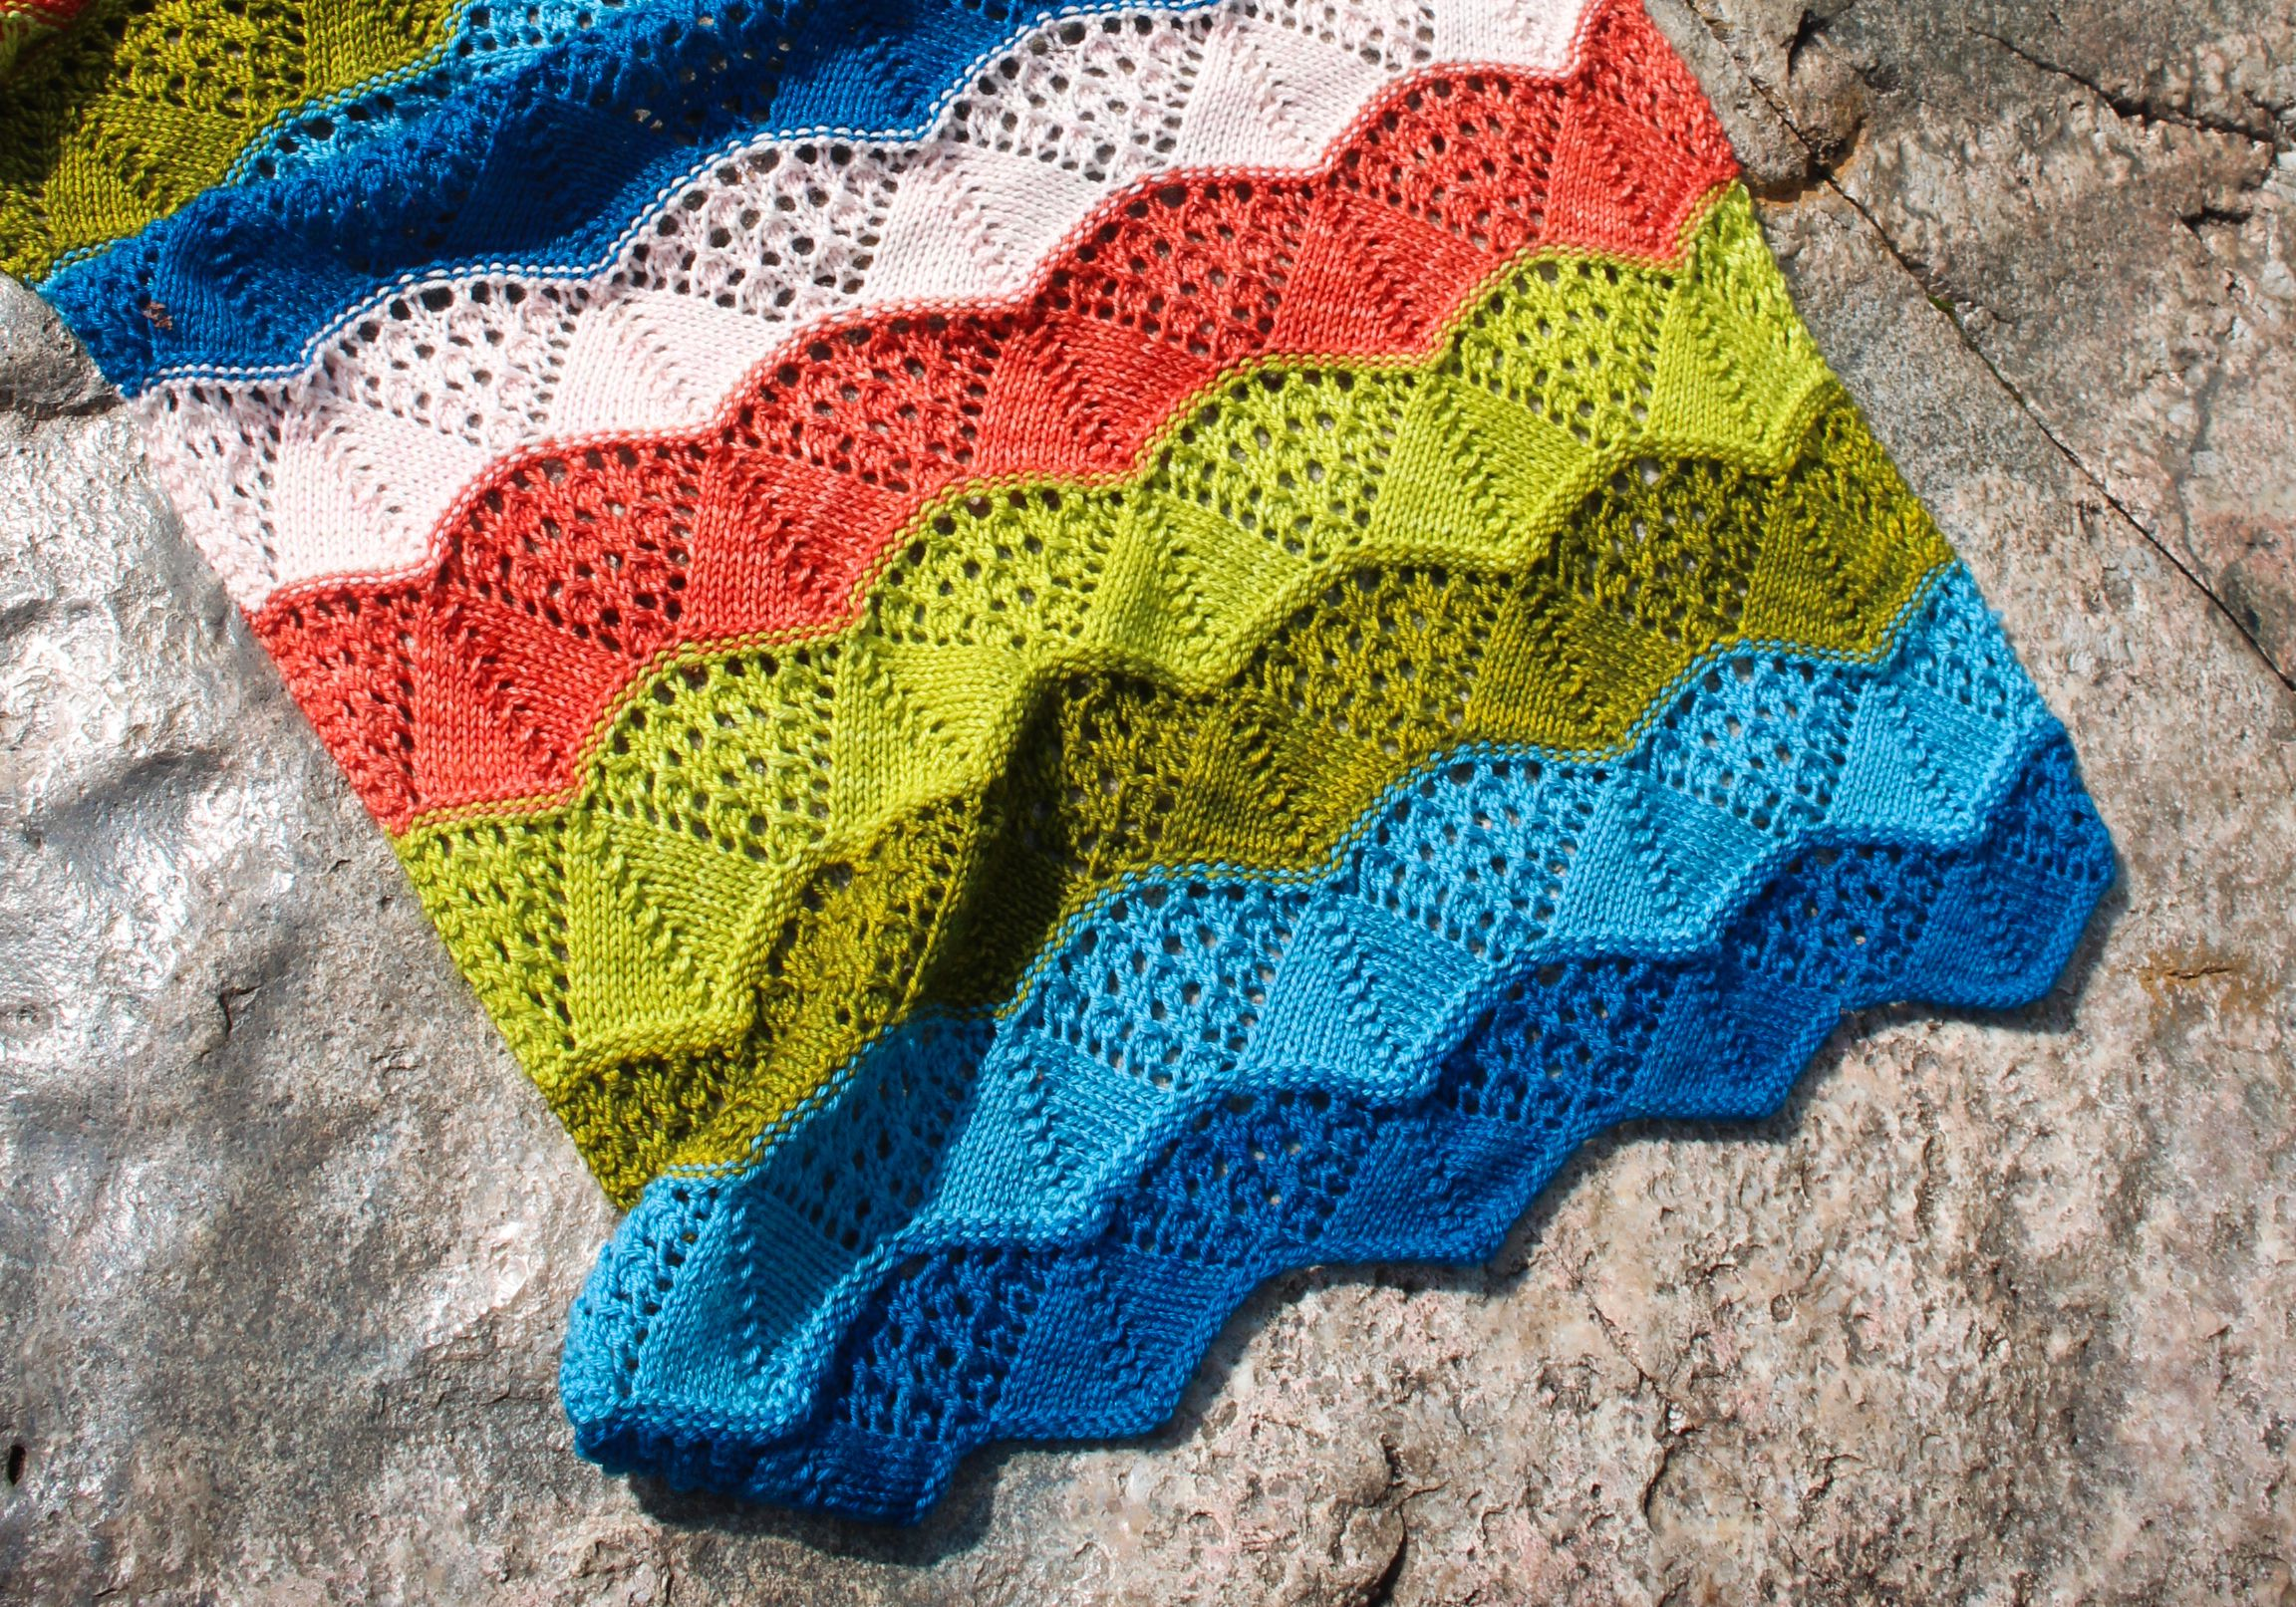 Lovequist Lace Baby Blanket Pattern